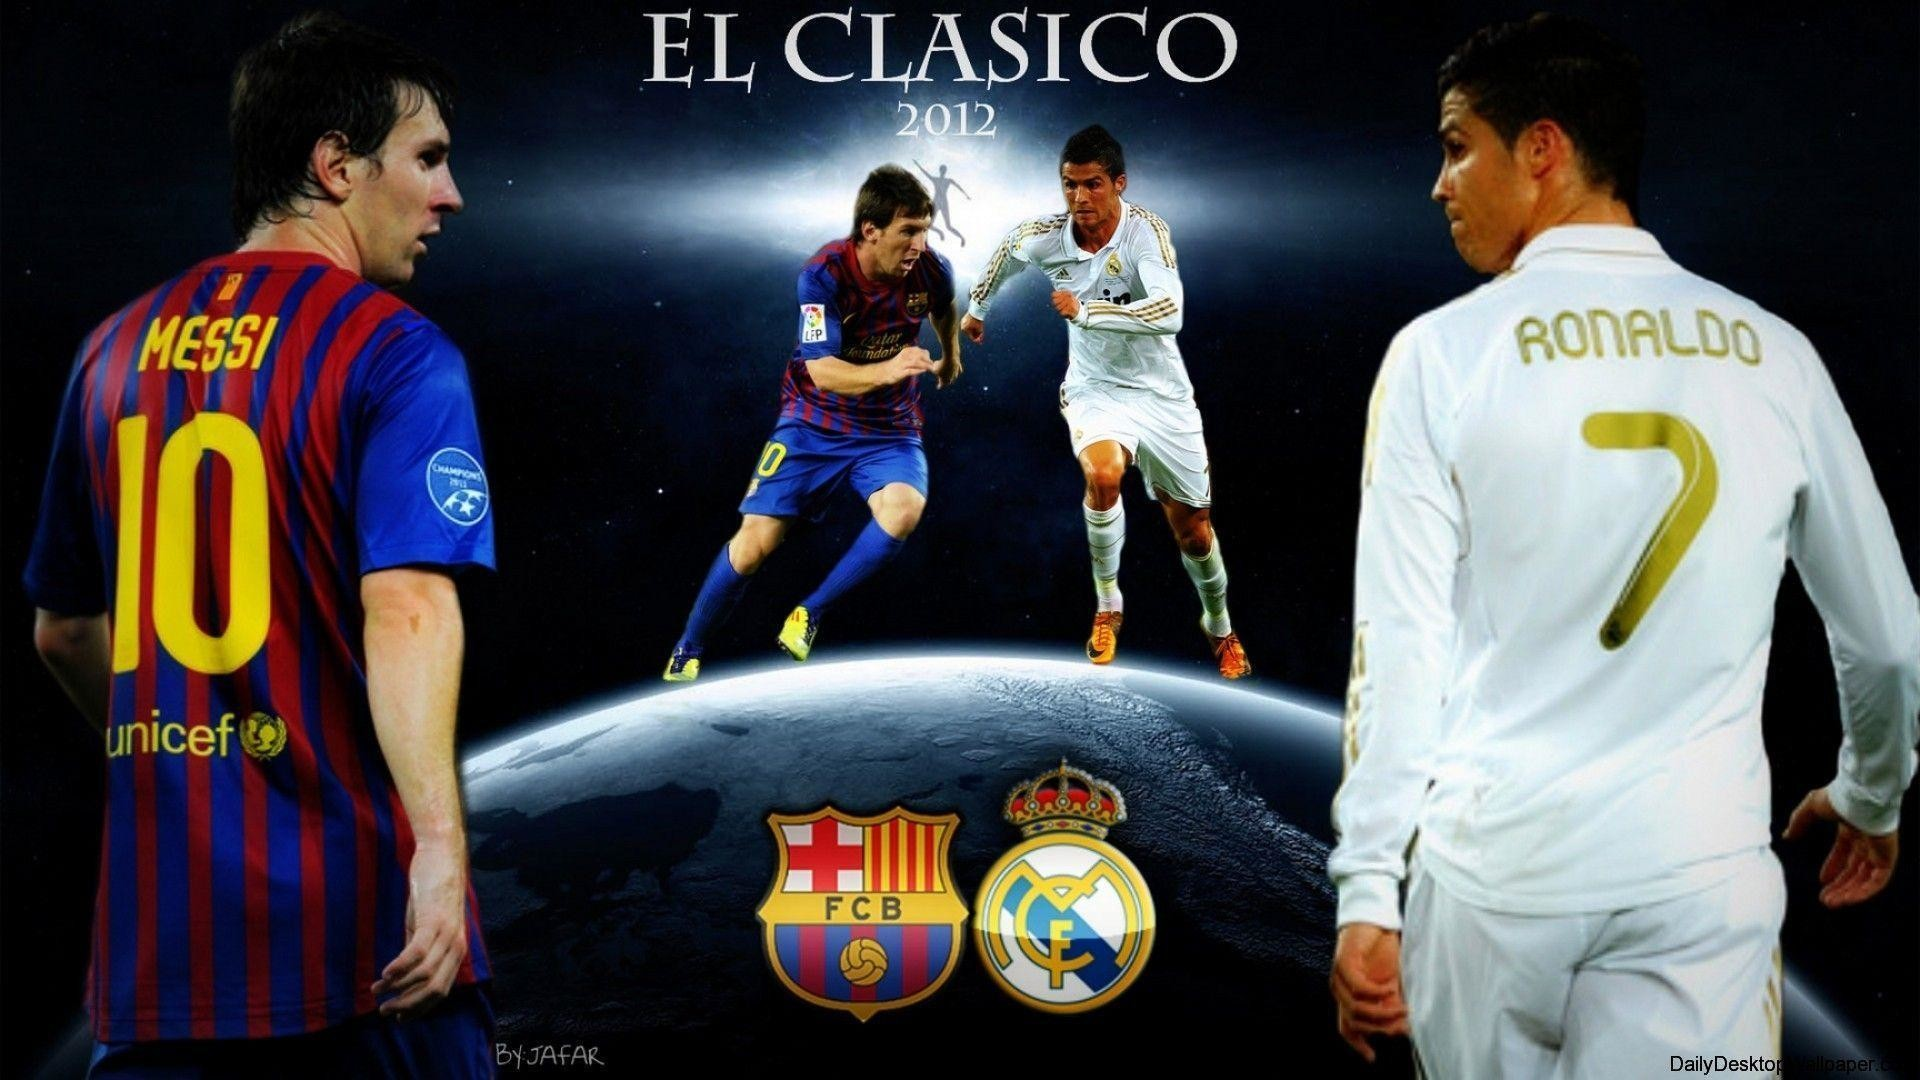 Messi-And-Ronaldo-2012 Messi wallpaper HD free wallpapers .